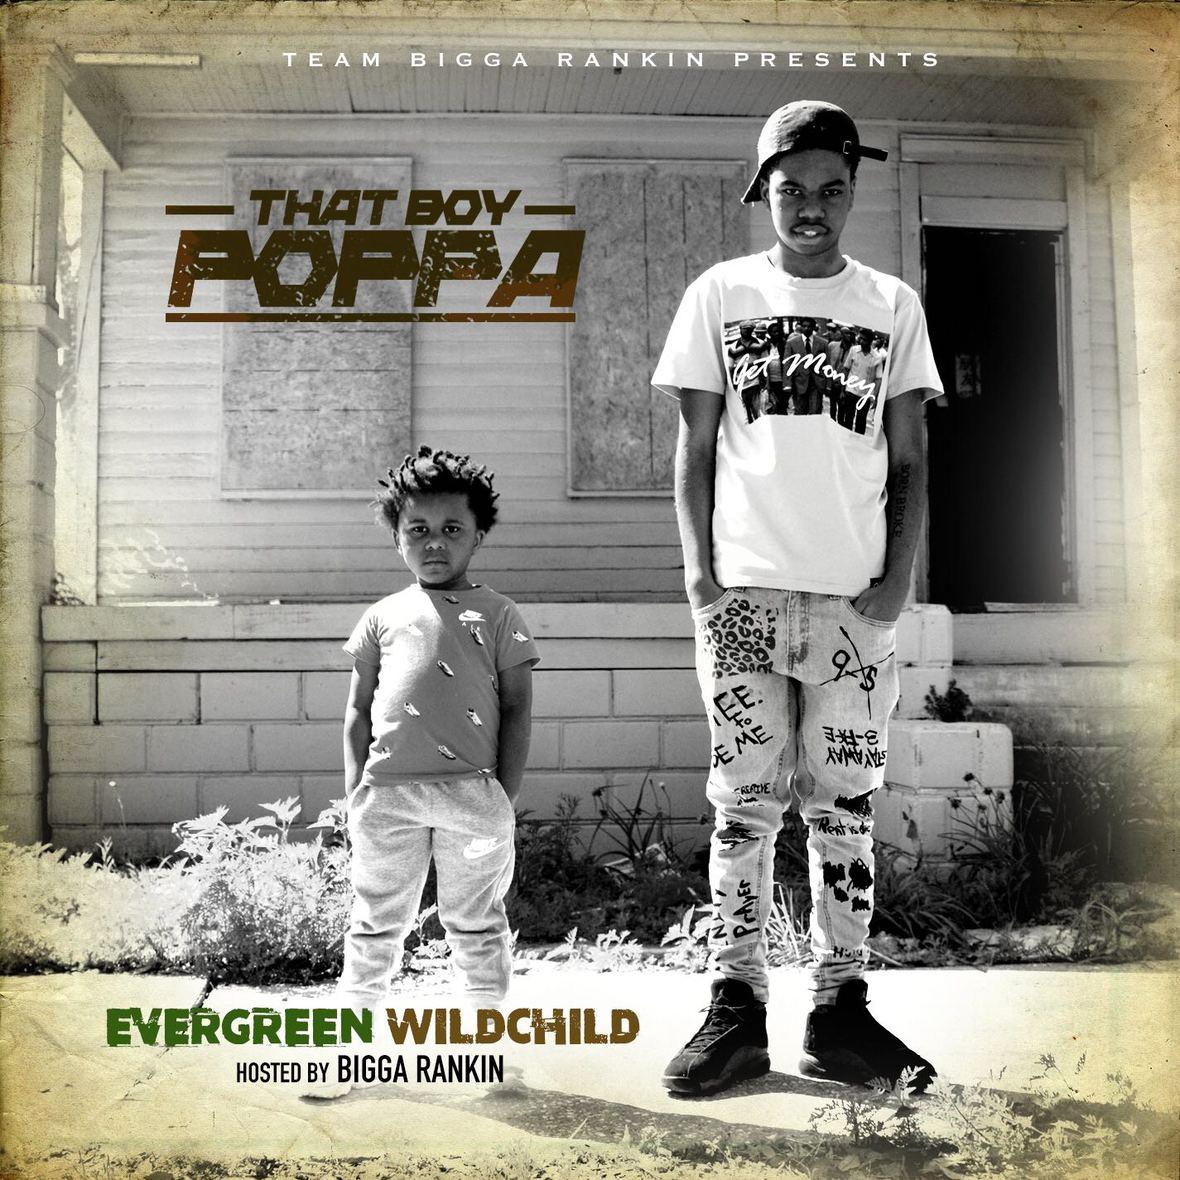 Poppa - Evergreen Wildchild artwork